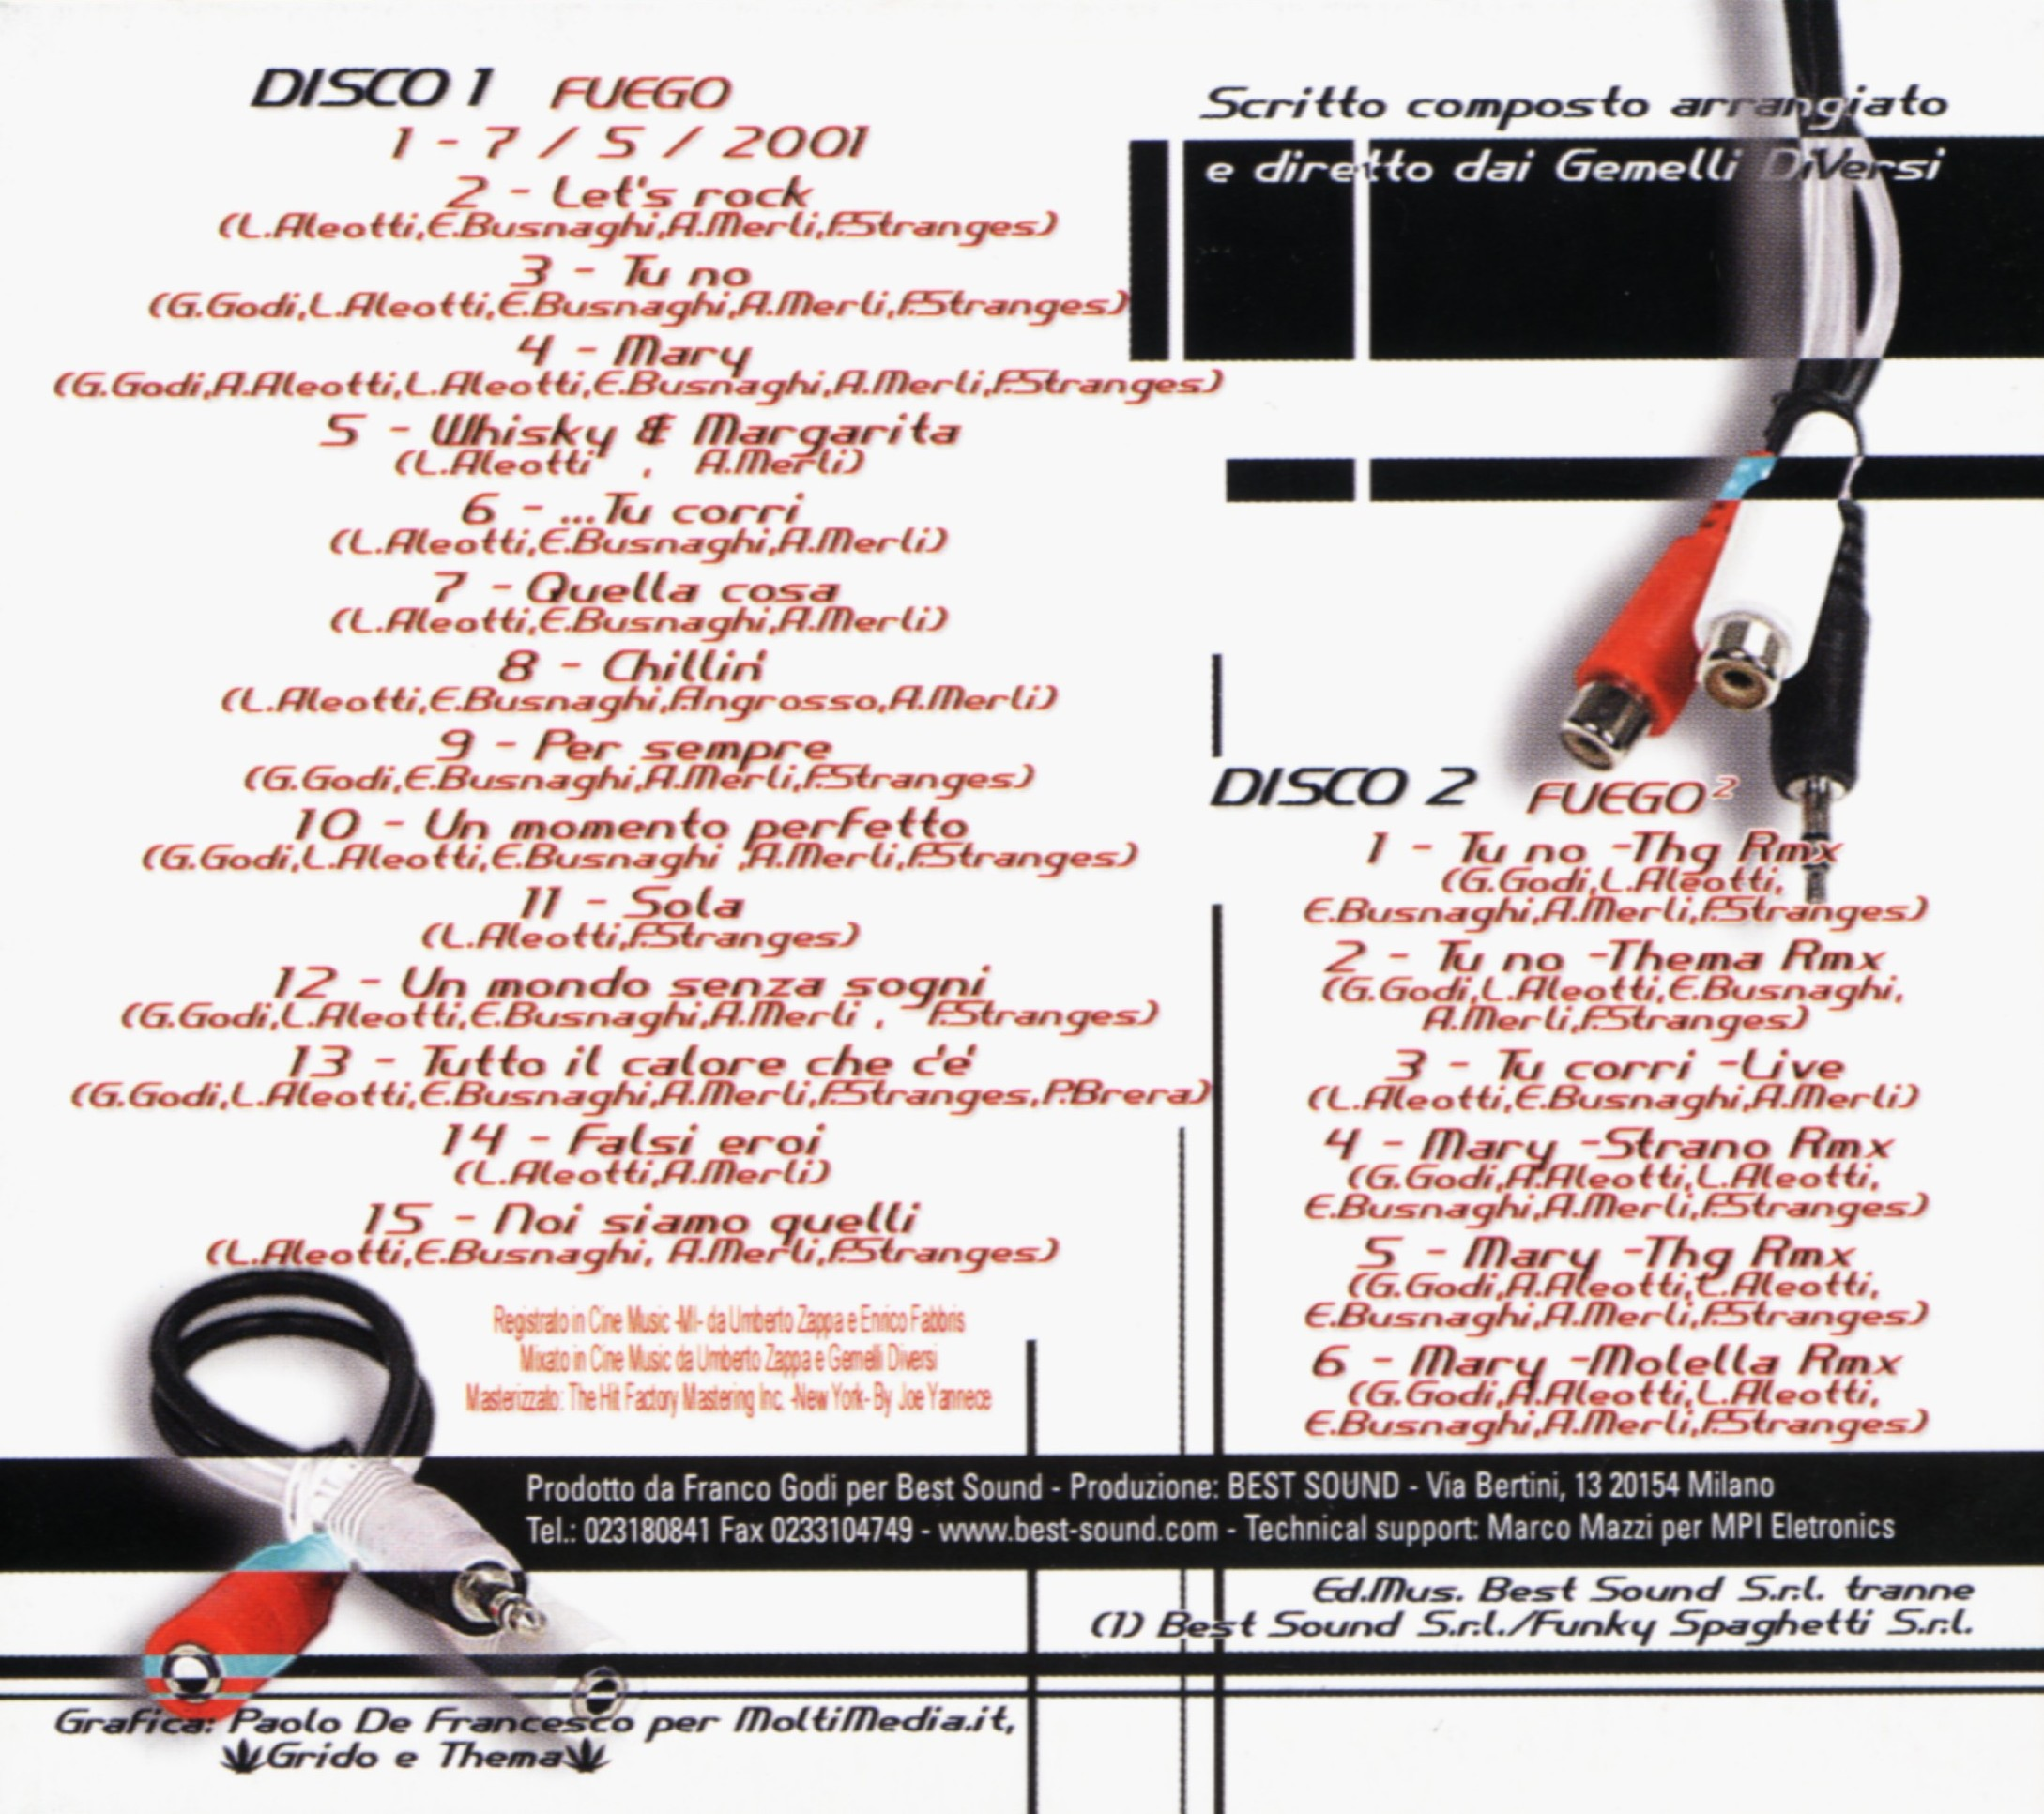 Scarica la copertina cd gemelli diversi fuego 2 inside scarica la cover cd gemelli diversi - 2 gemelli diversi ...